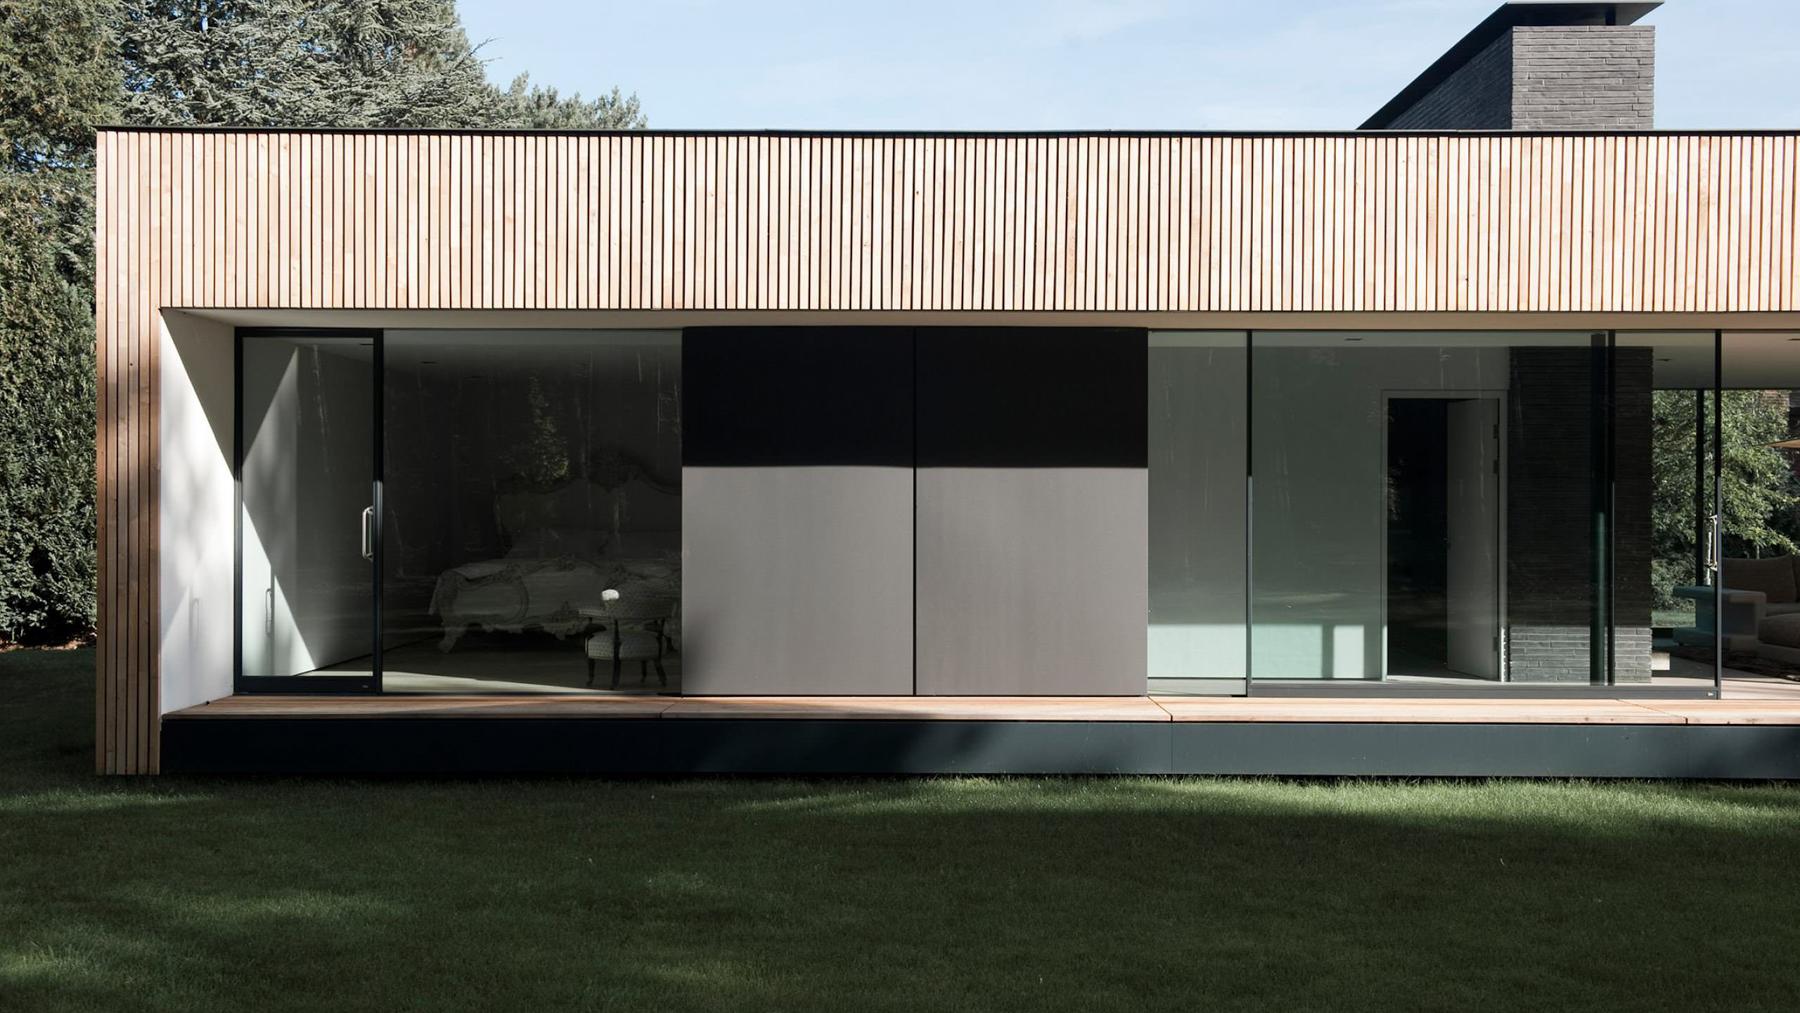 CroppedFocusedImage25601440-Strom-Architects-Watson-2.jpg